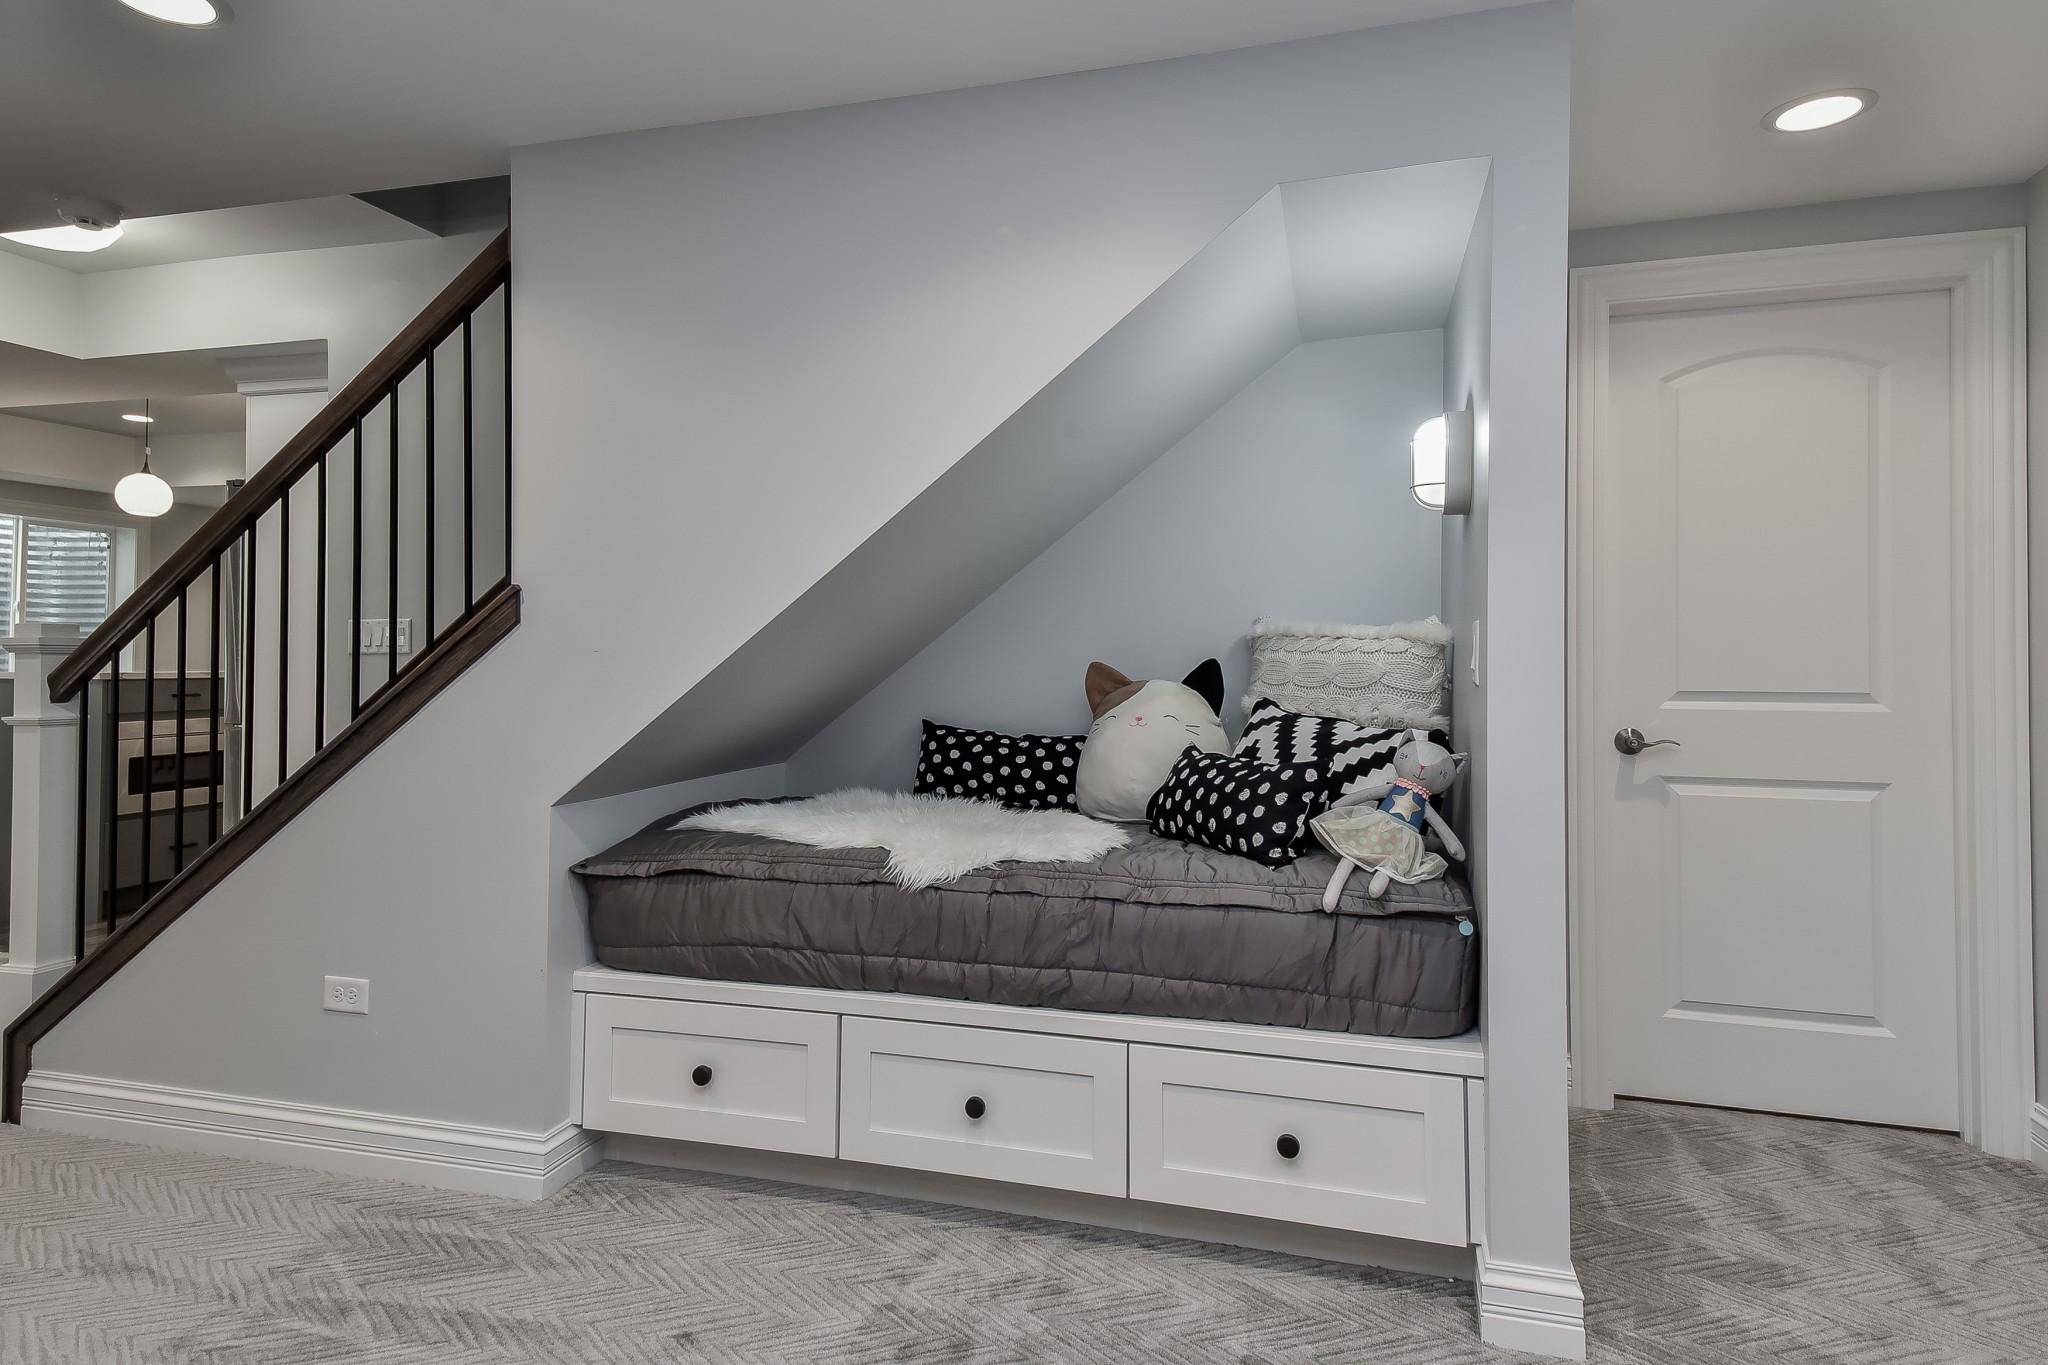 13 Top Trends In Basement Design For 2021 Home Remodeling Contractors Sebring Design Build